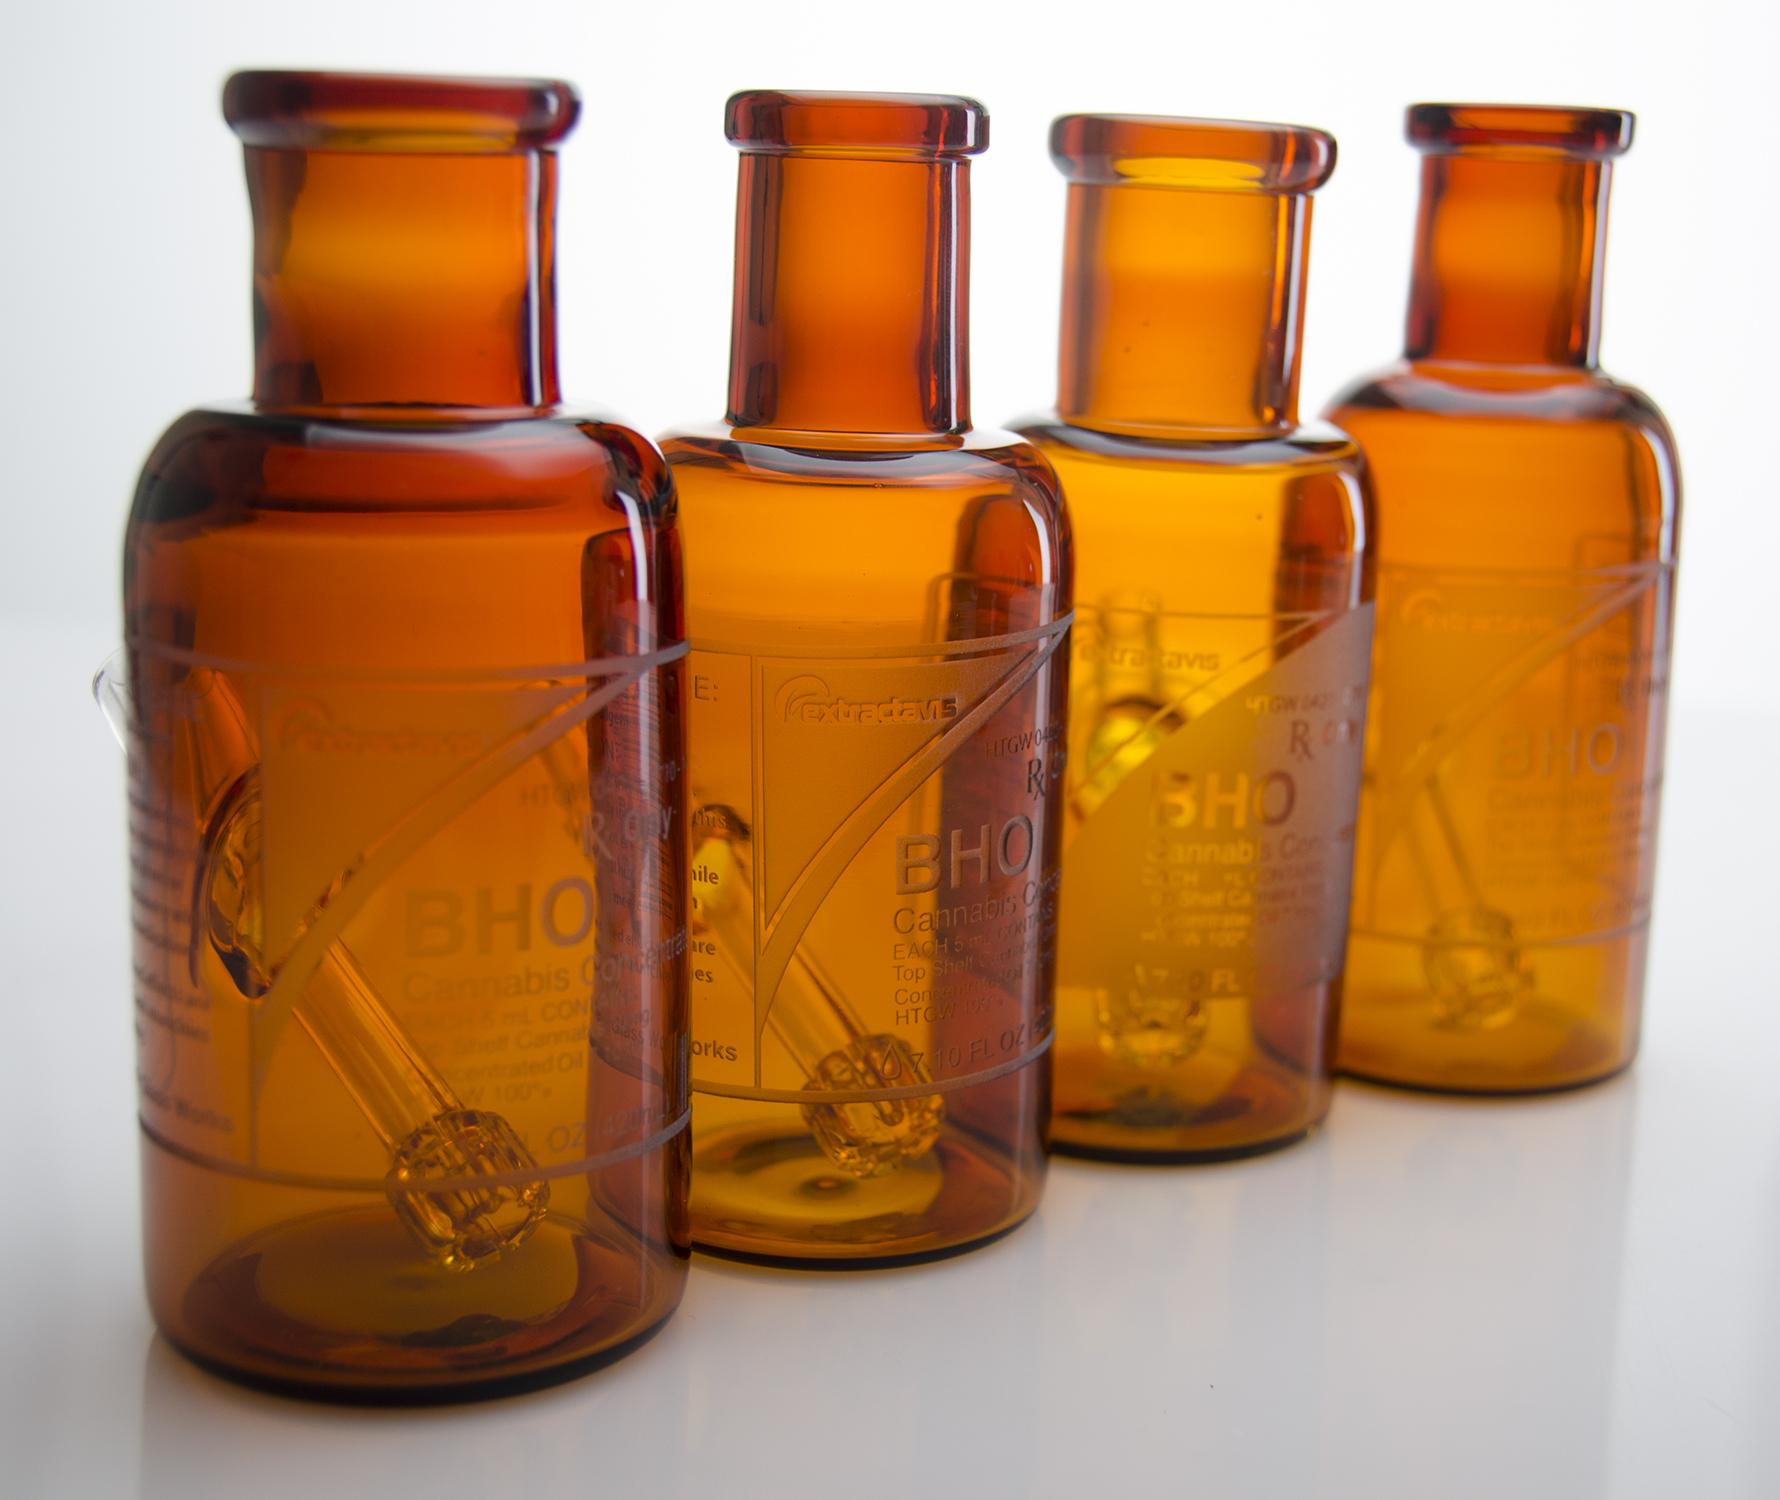 Extractivis Bottle Rig-multiview.jpg